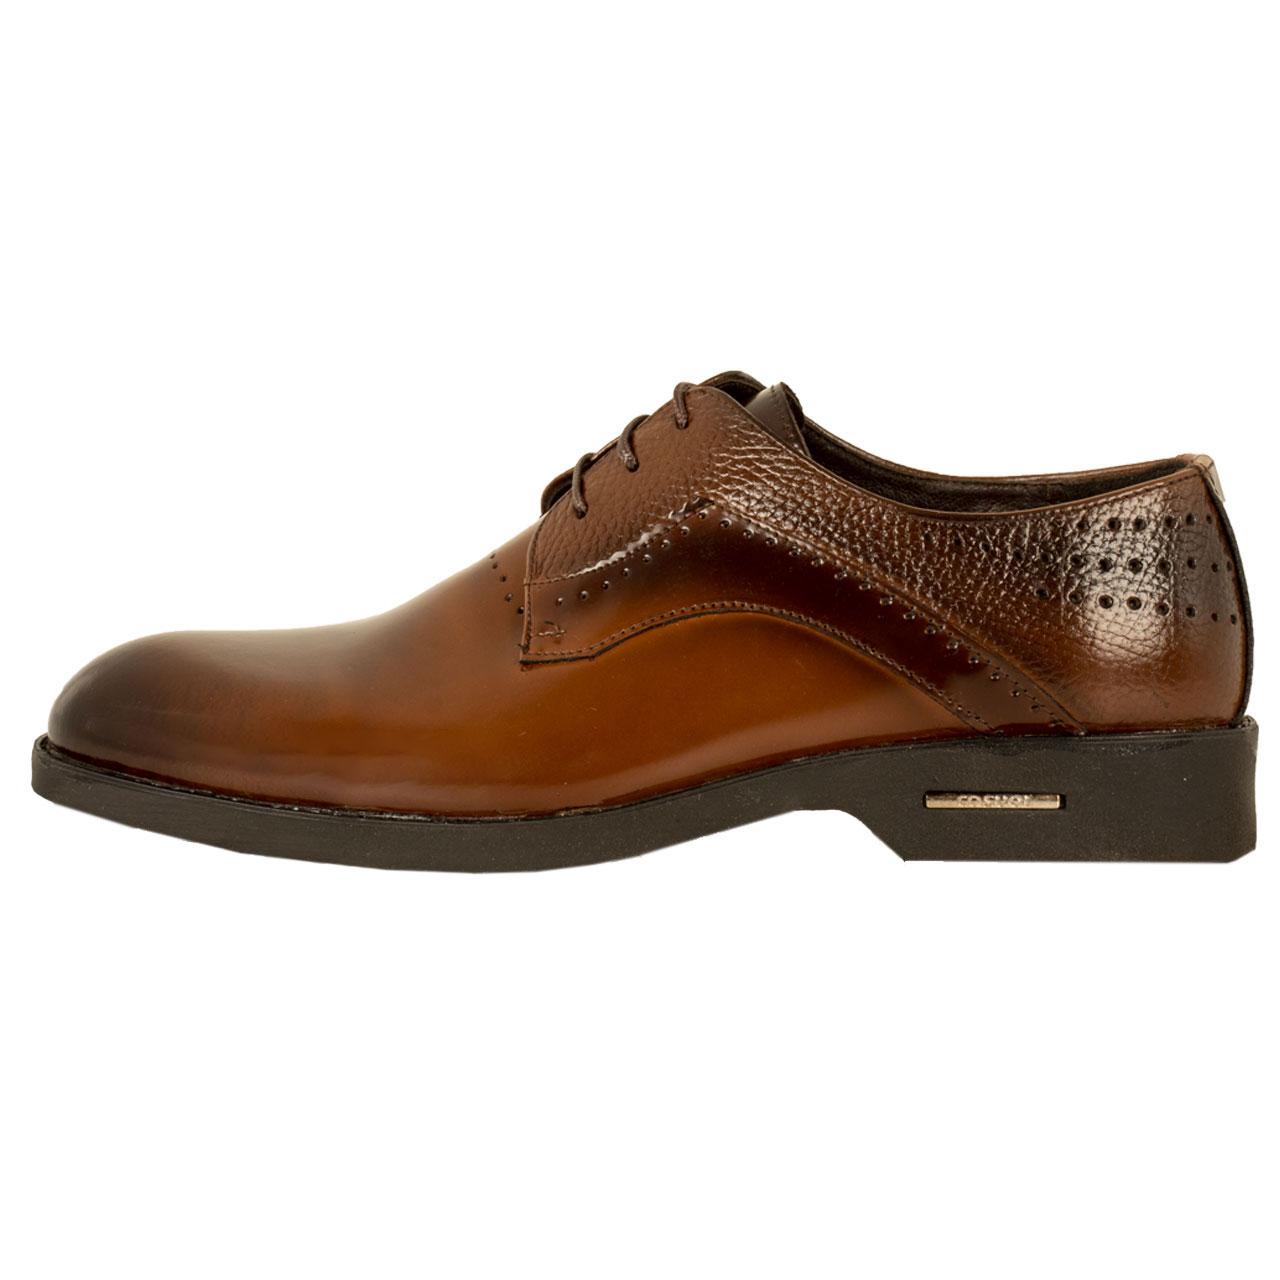 کفش مردانه پارینه چرم مدل SHO205